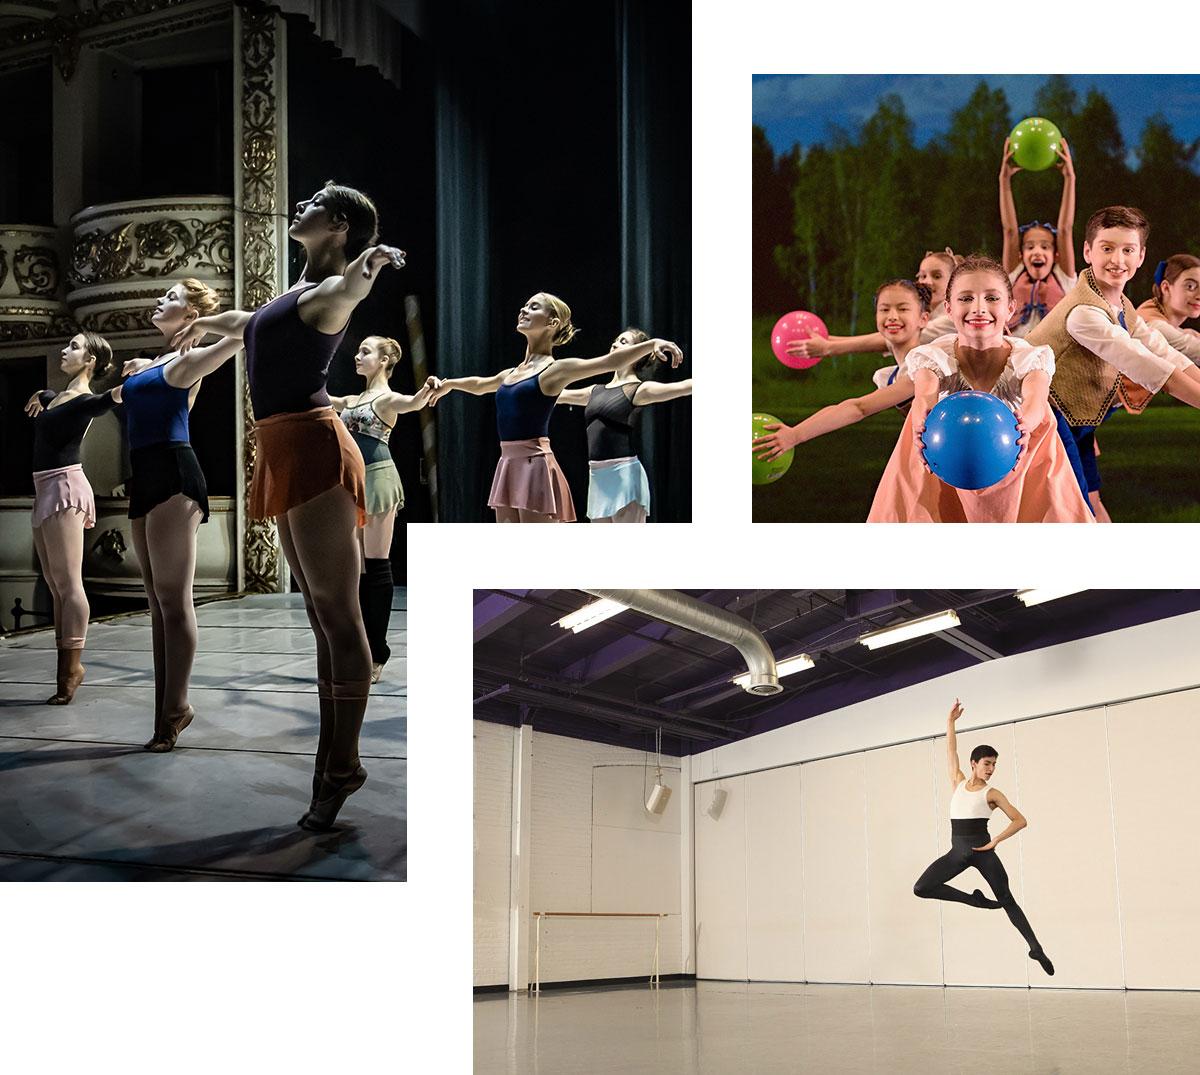 Draper Center Ballet School, Monroe County, Rochester NY